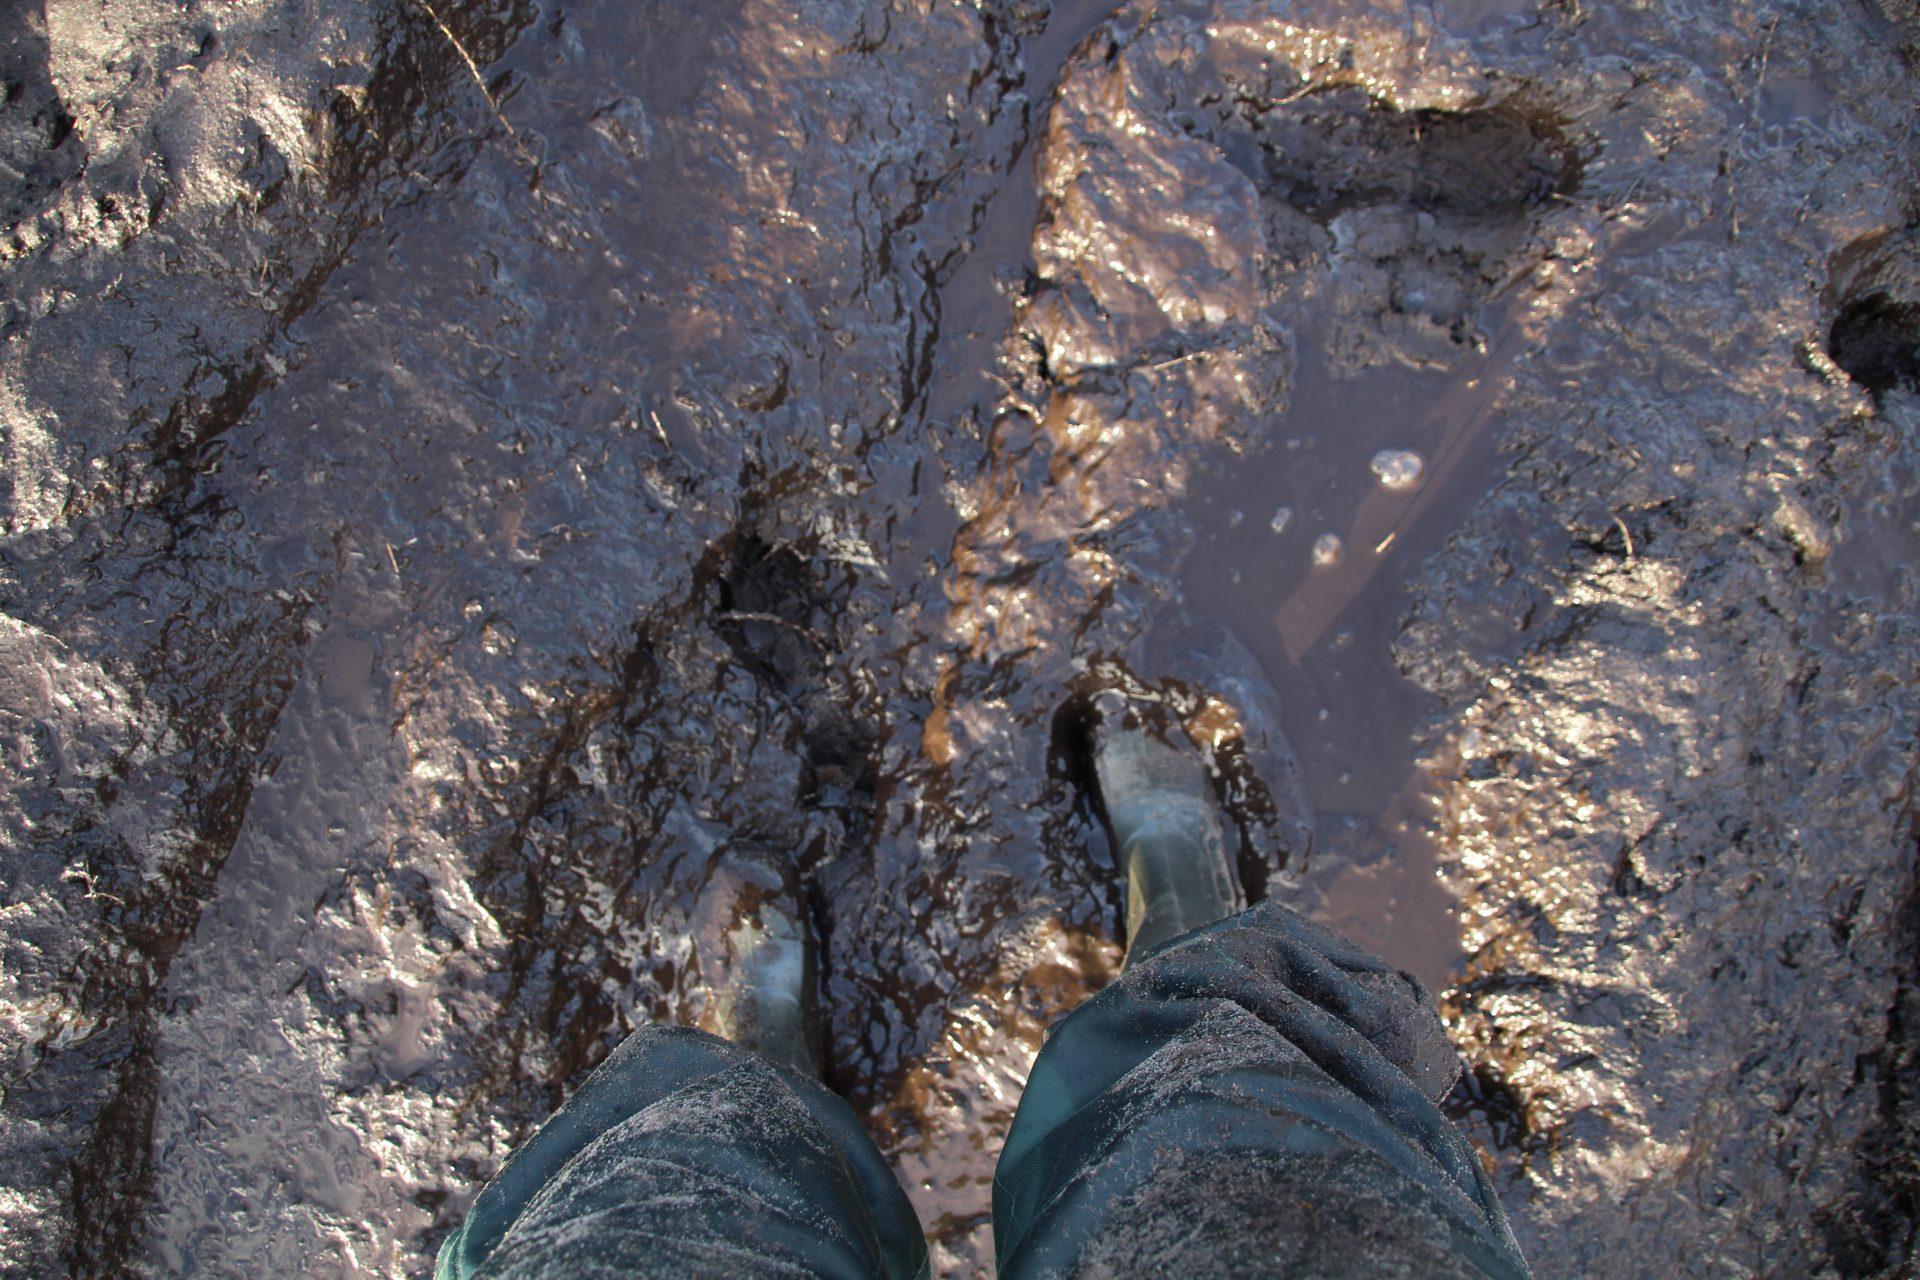 Person står i mudderpøl